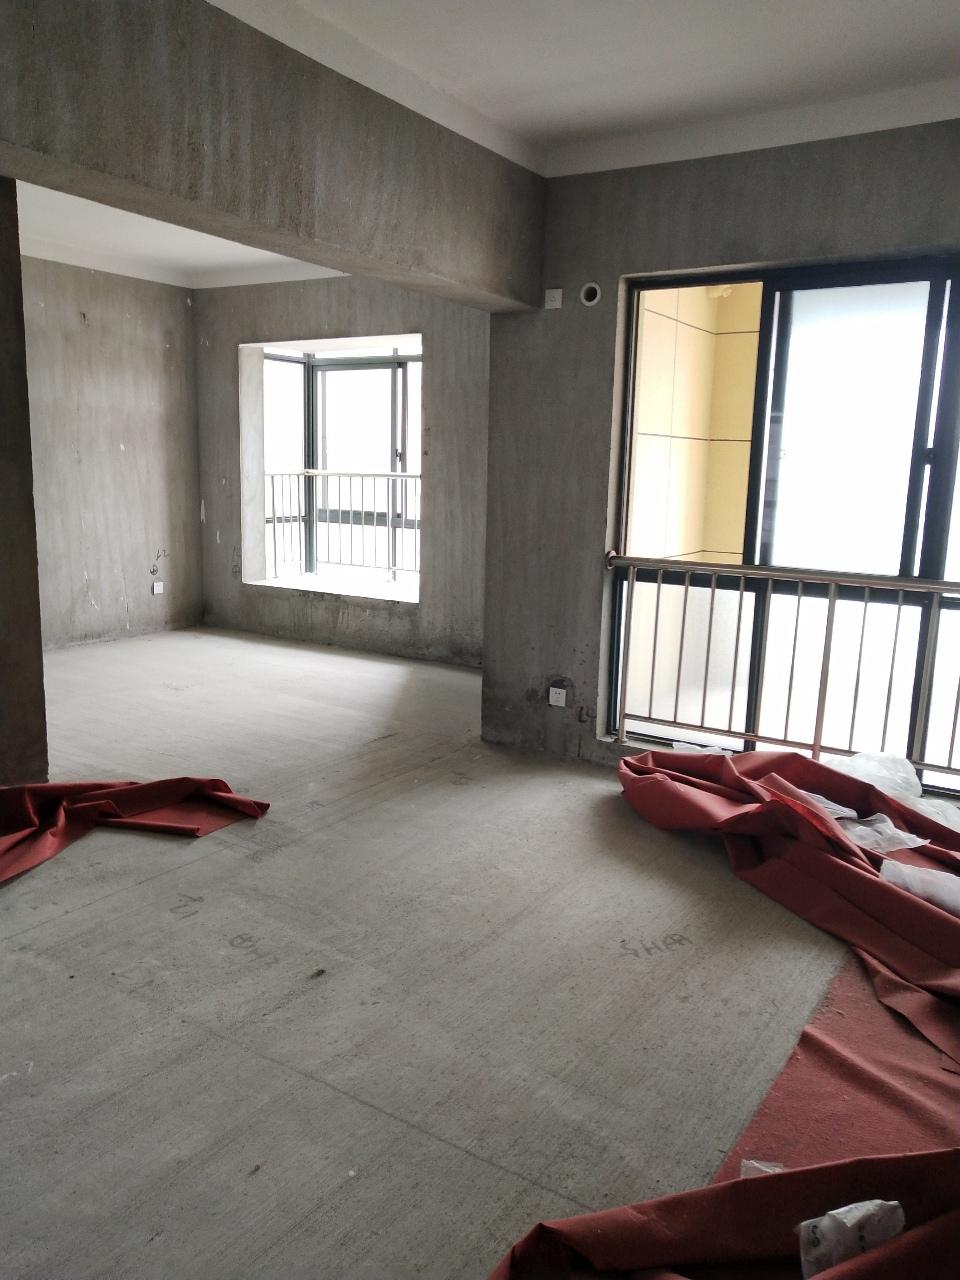 黄金海岸4室 2厅 2卫106万元